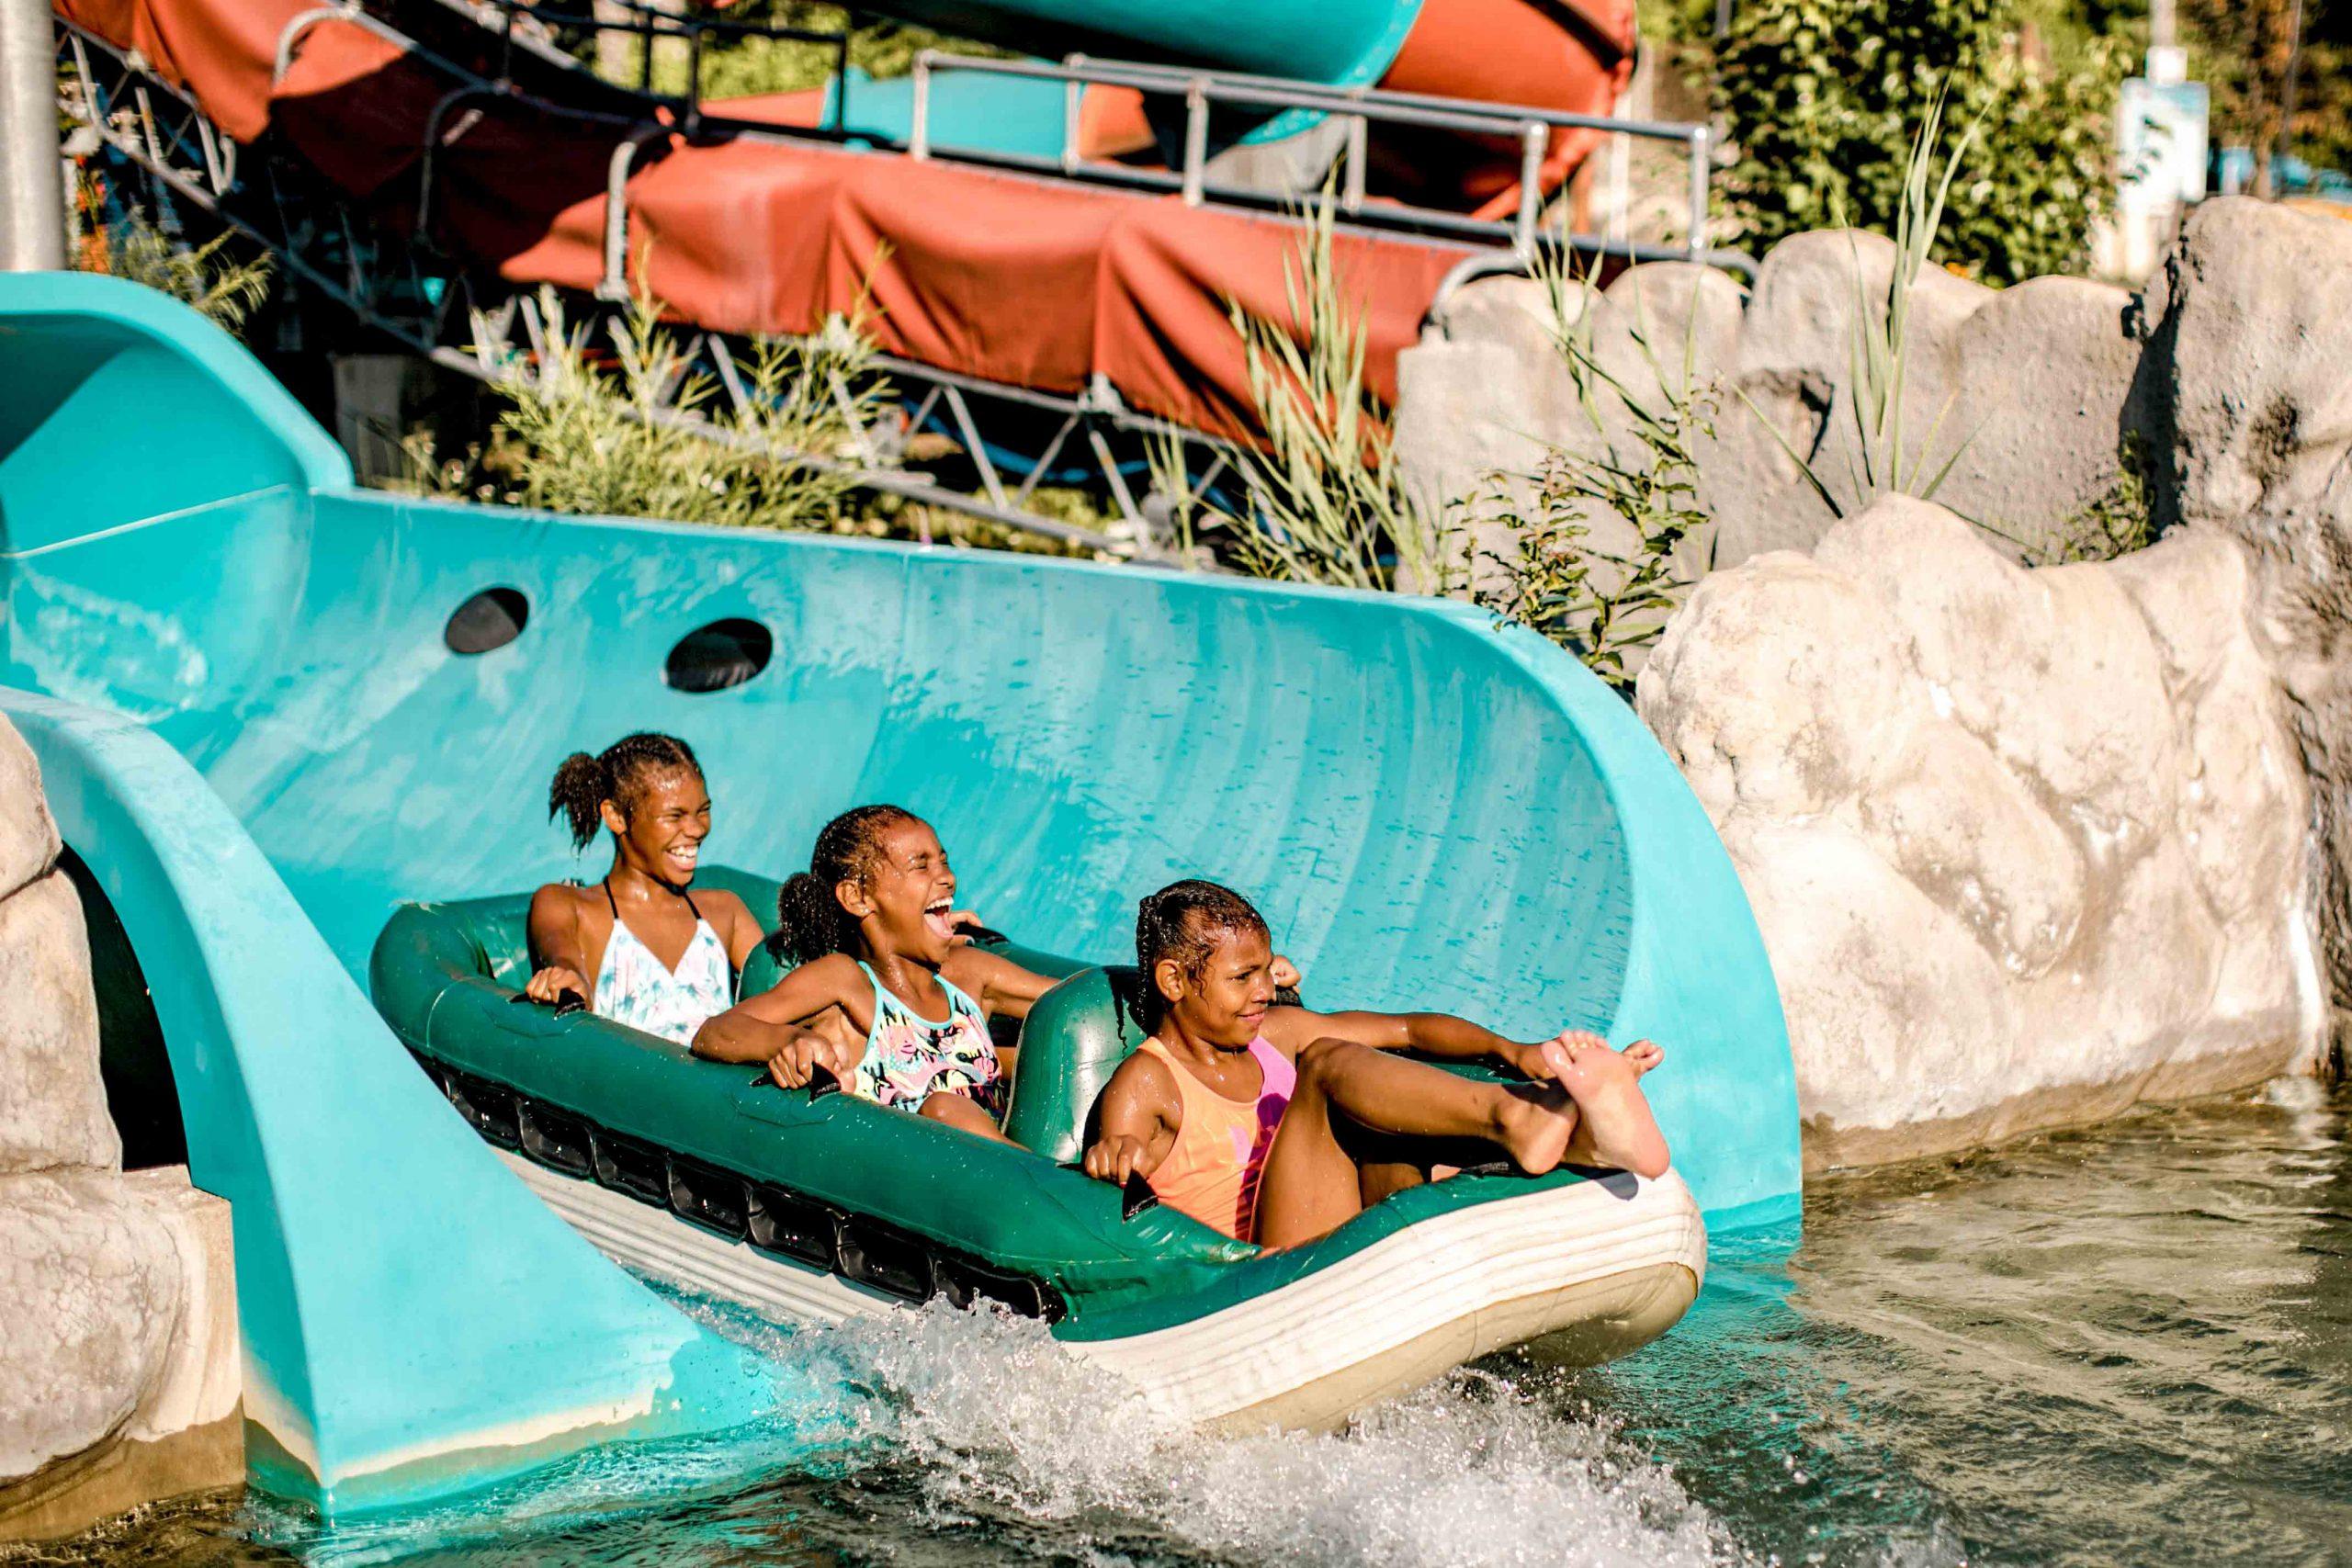 Trois petites filles qui glissent dans le Tsunami, glissade orange et verte